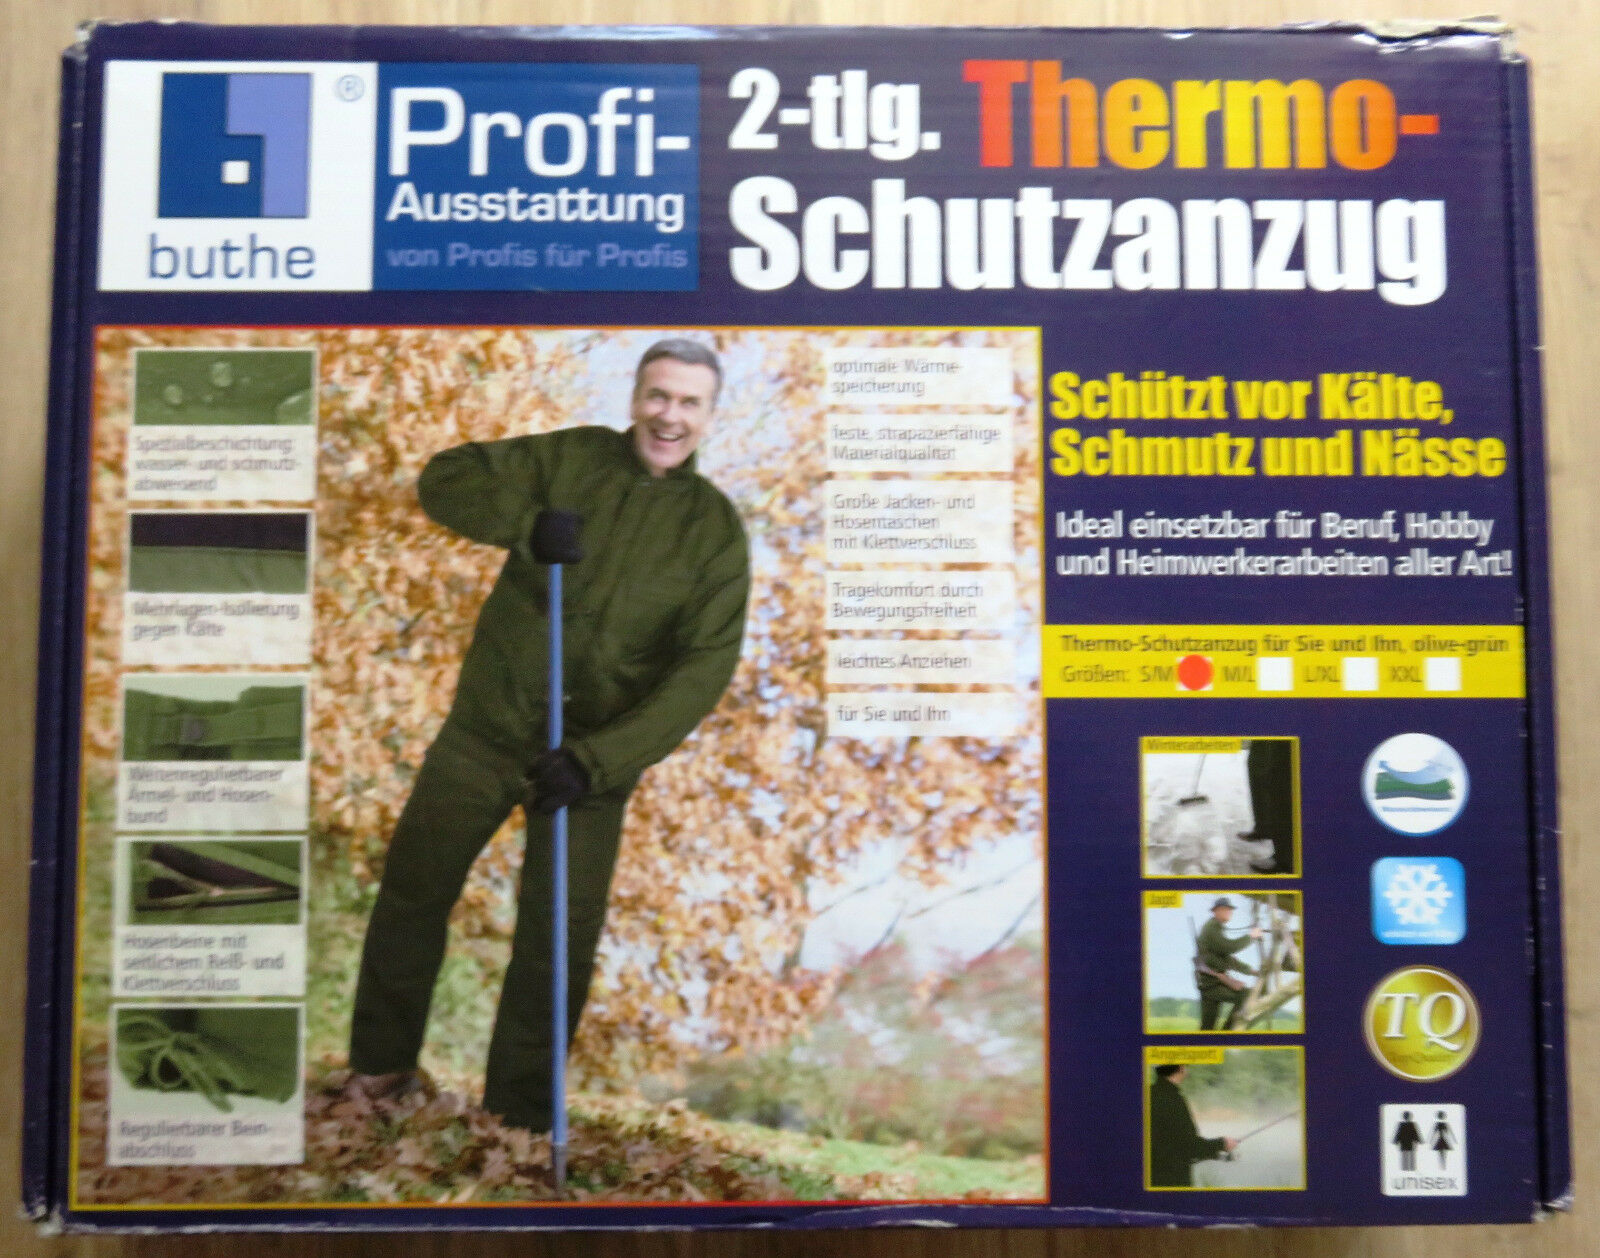 Thermo traje projoector 2 piezas talla S M  impermeable pesCoche caza Ejército verde oliva nuevo  mejor precio